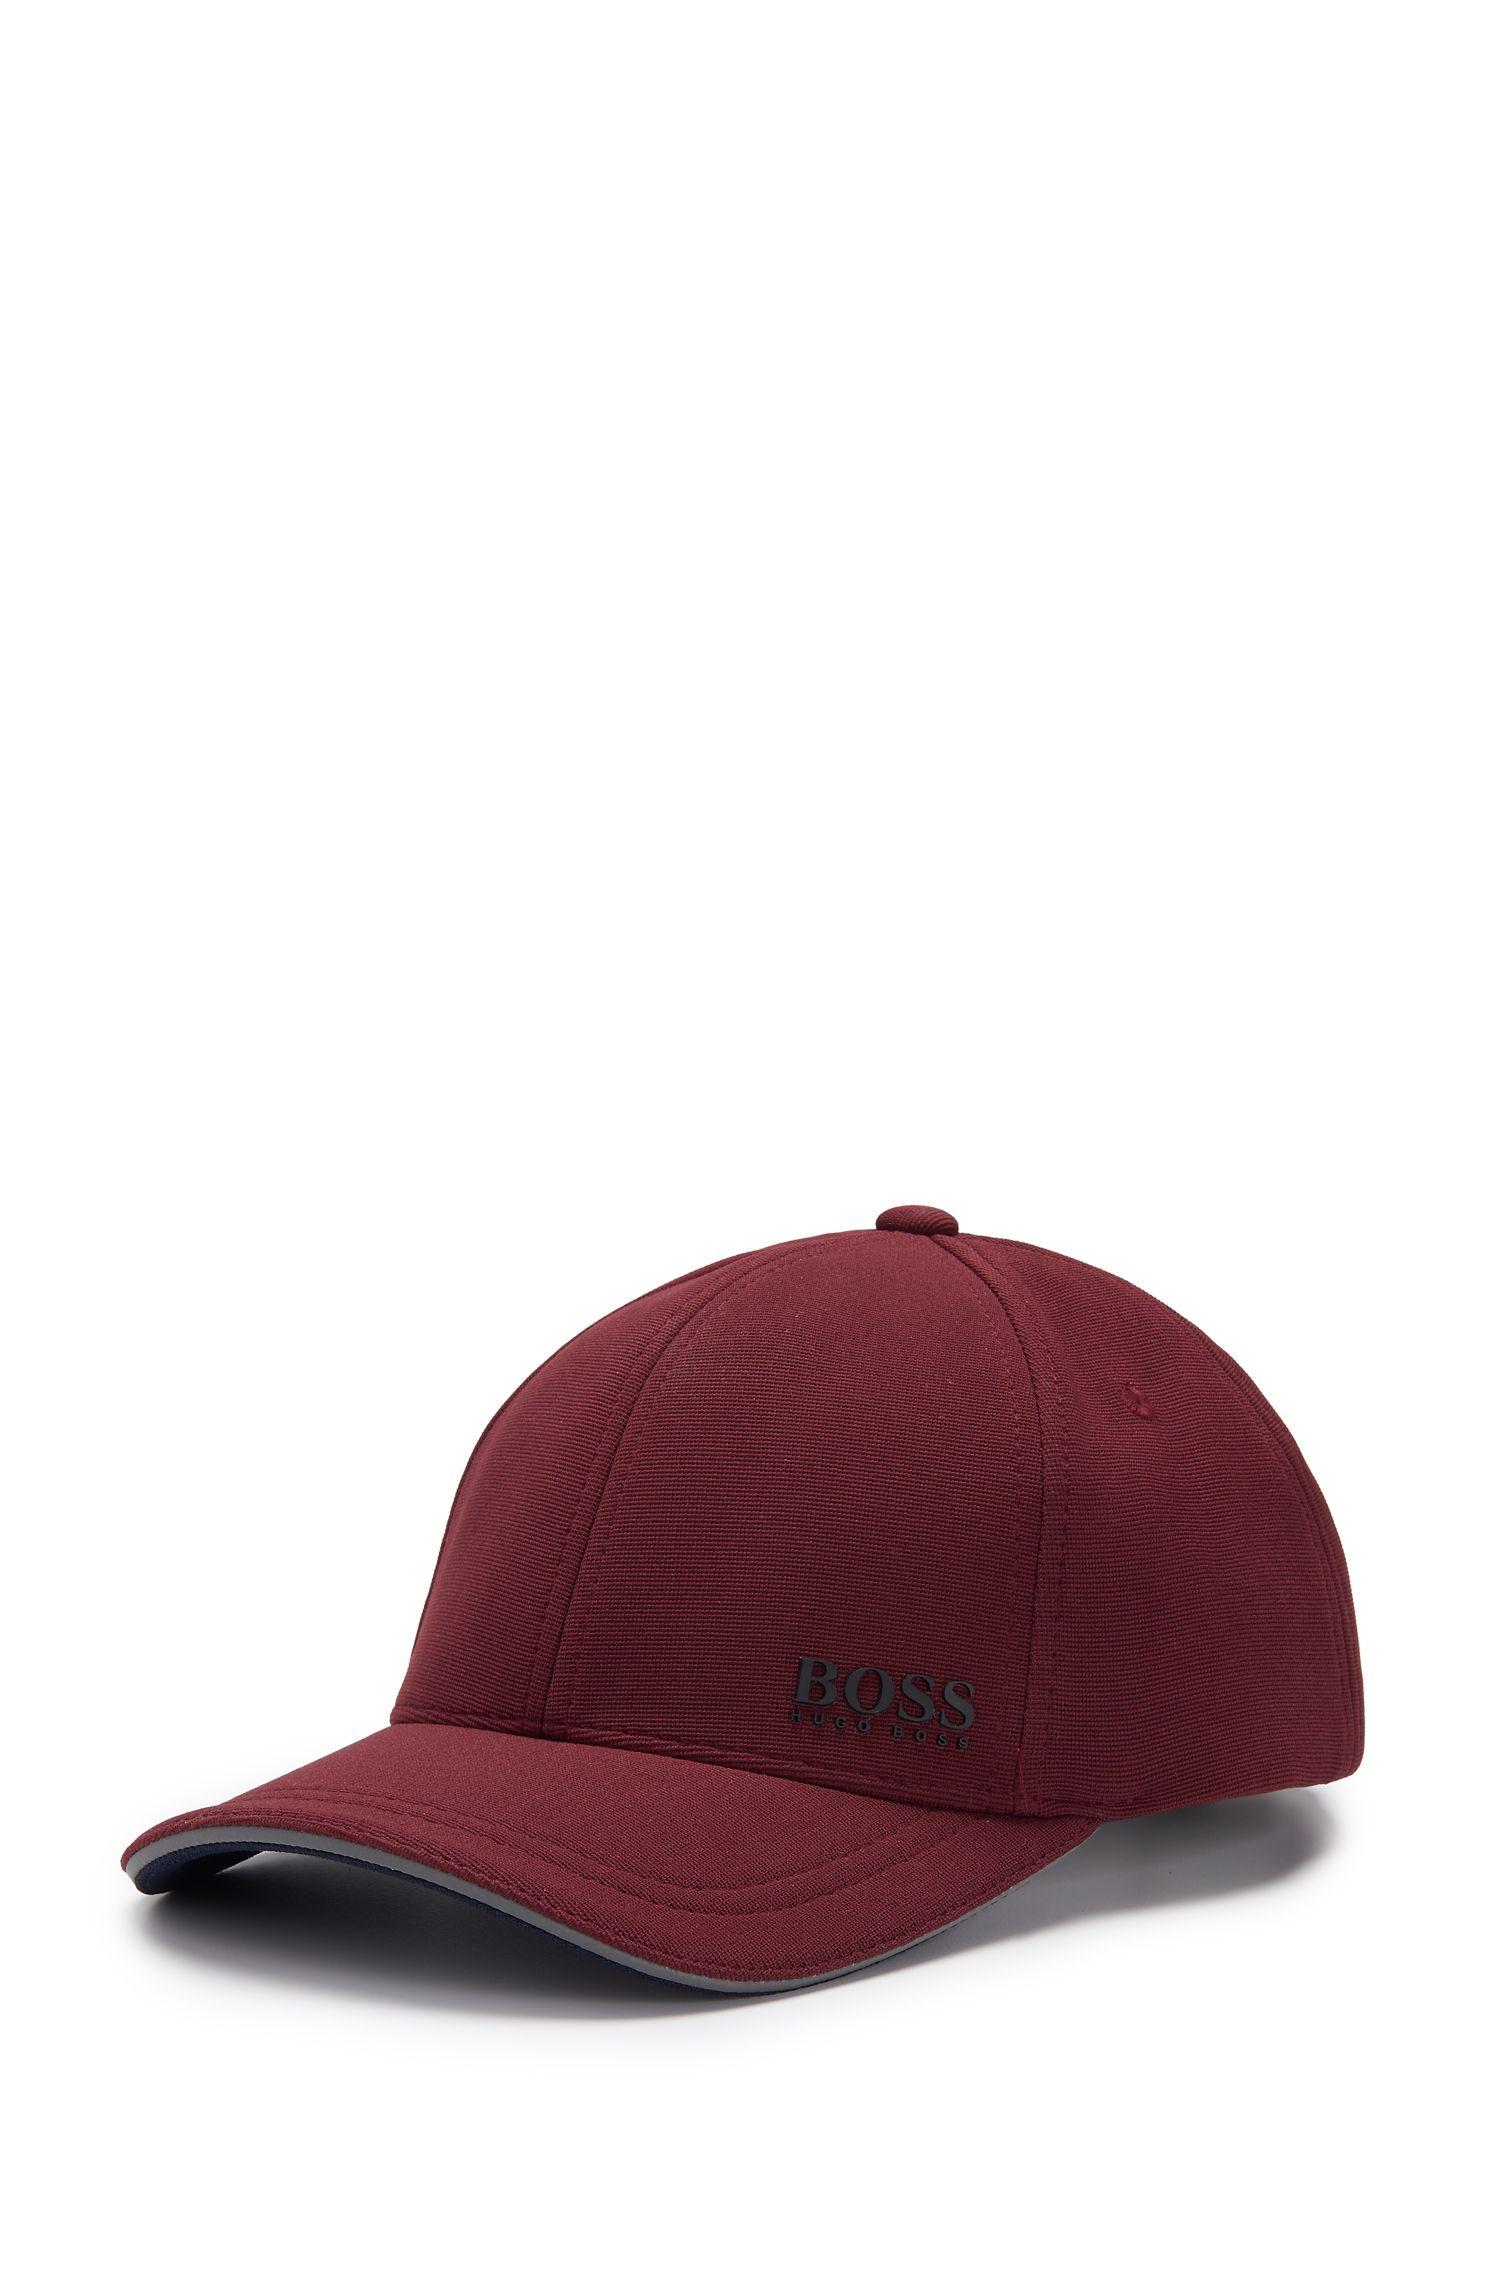 Baseball Cap | Weekend Cap, Red